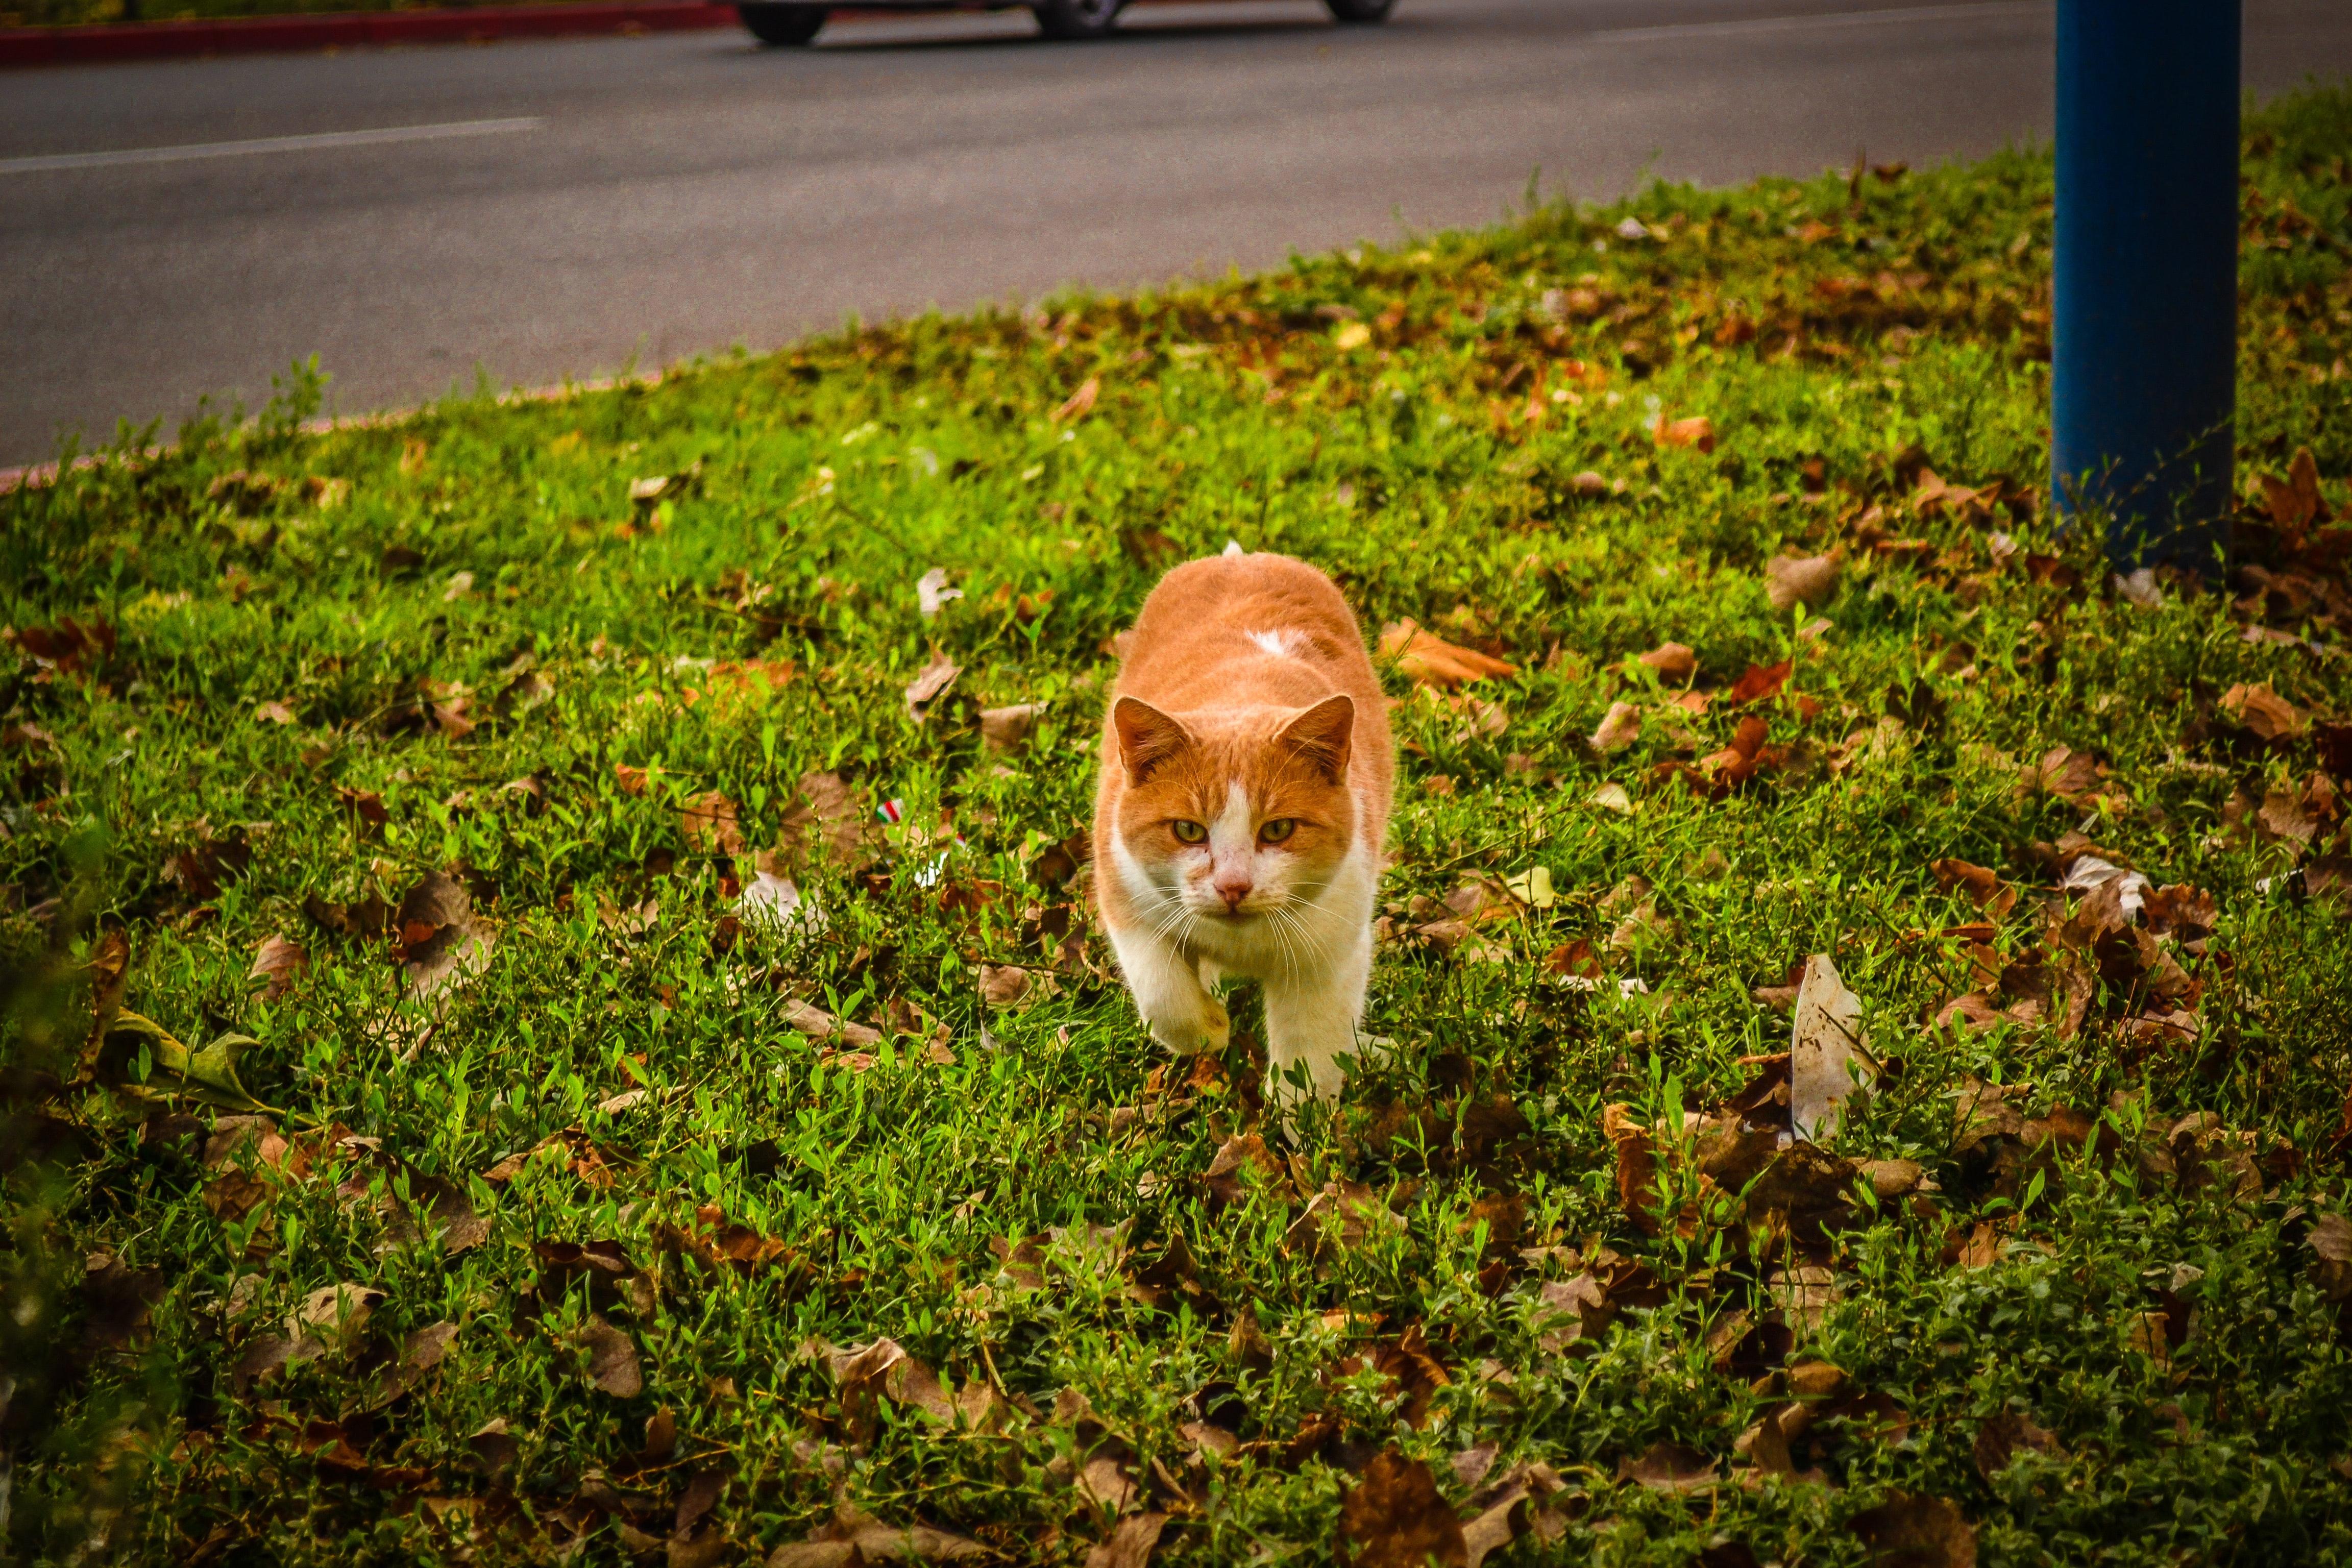 White and orange cat walking on green grass during dayime photo